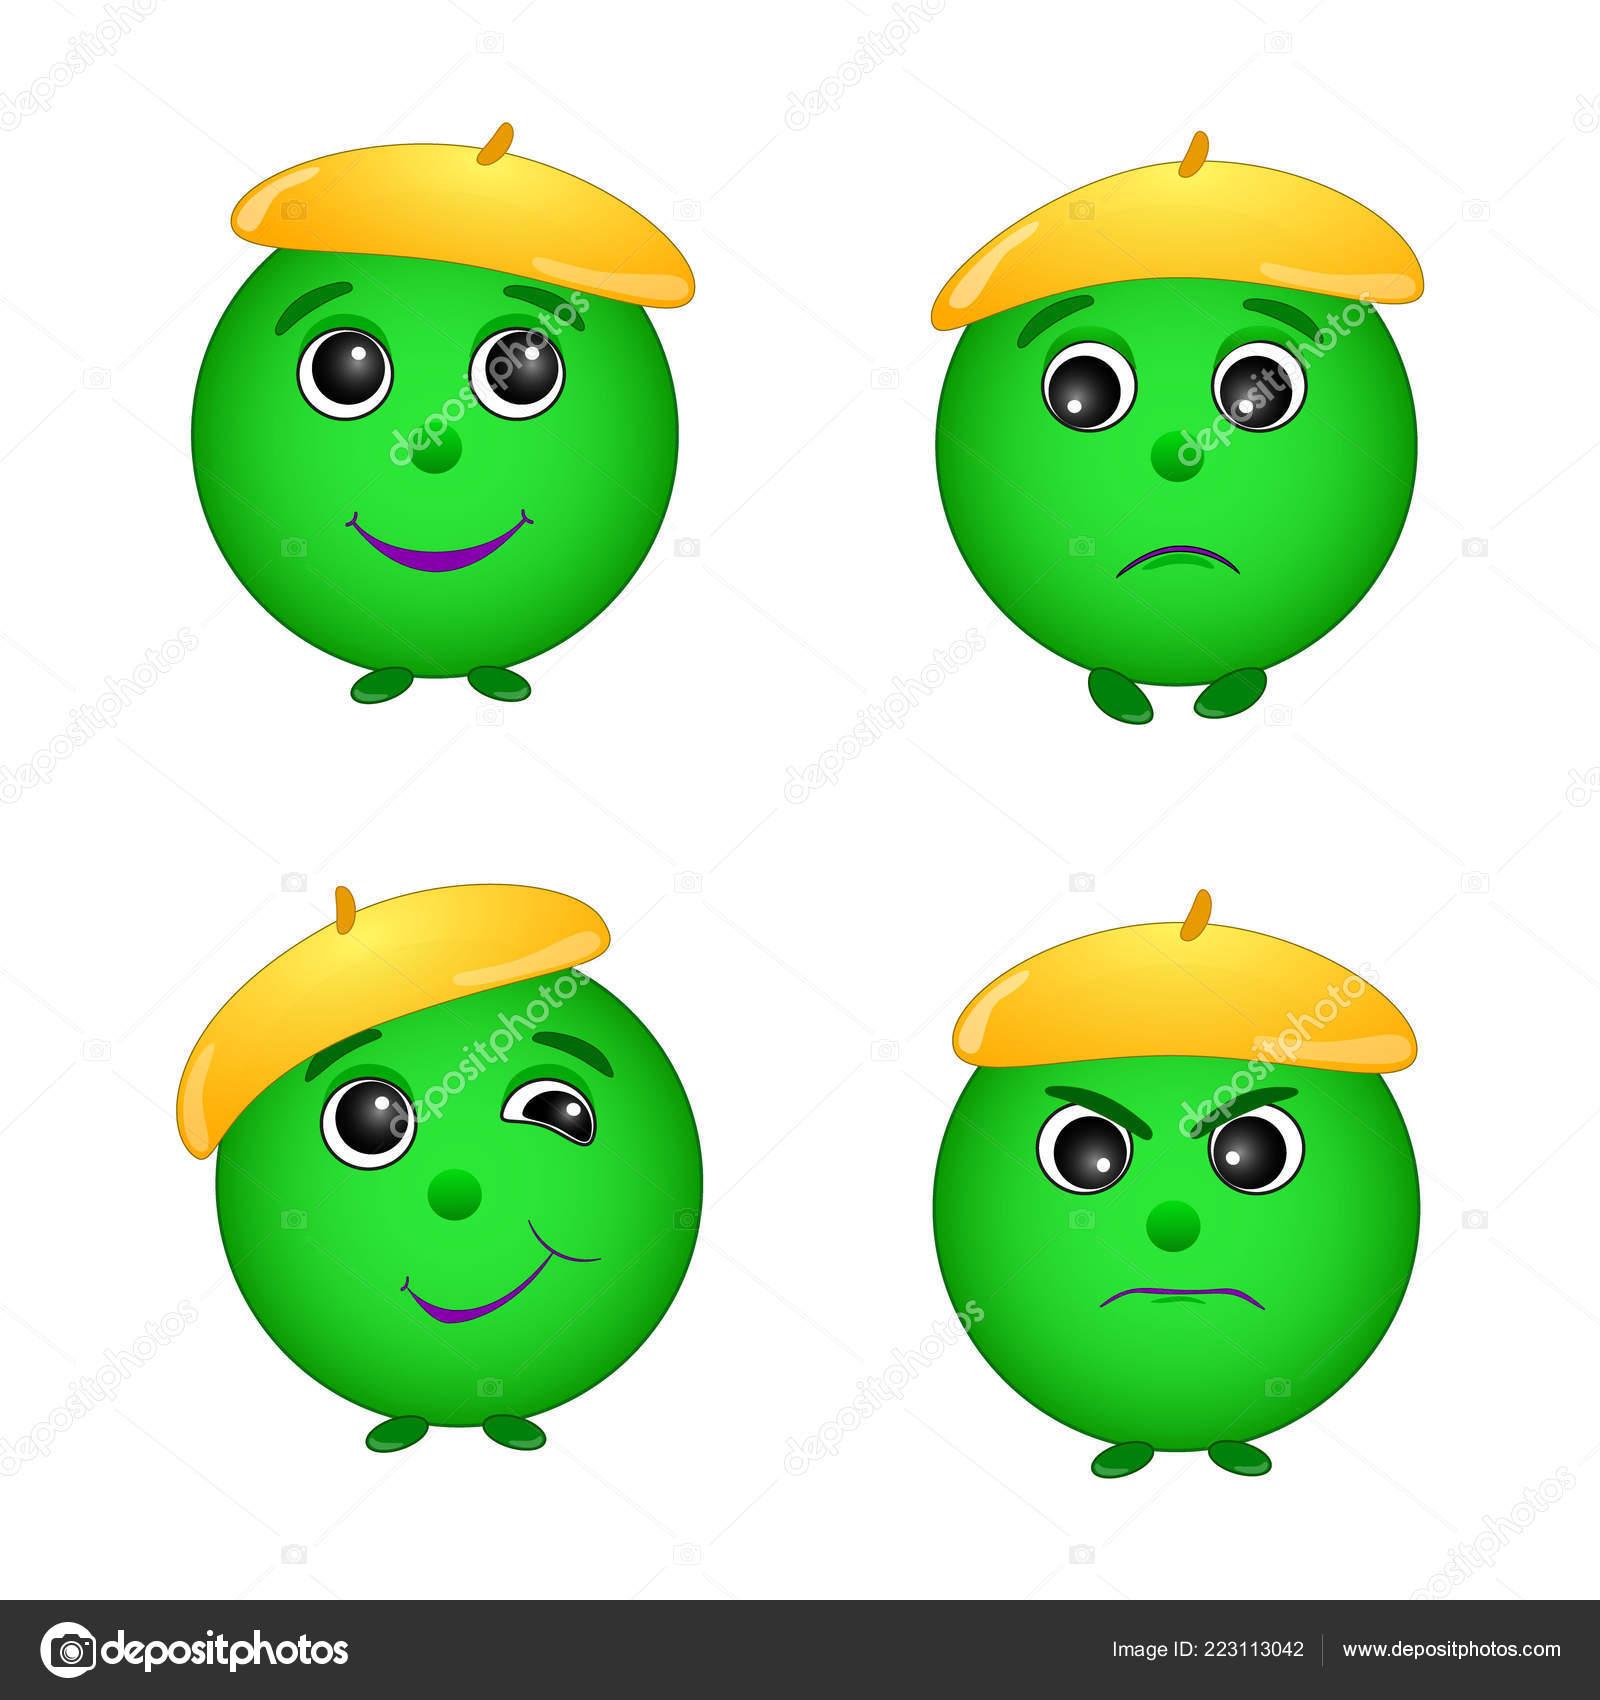 Set of different emotion green smiley illustration in vector